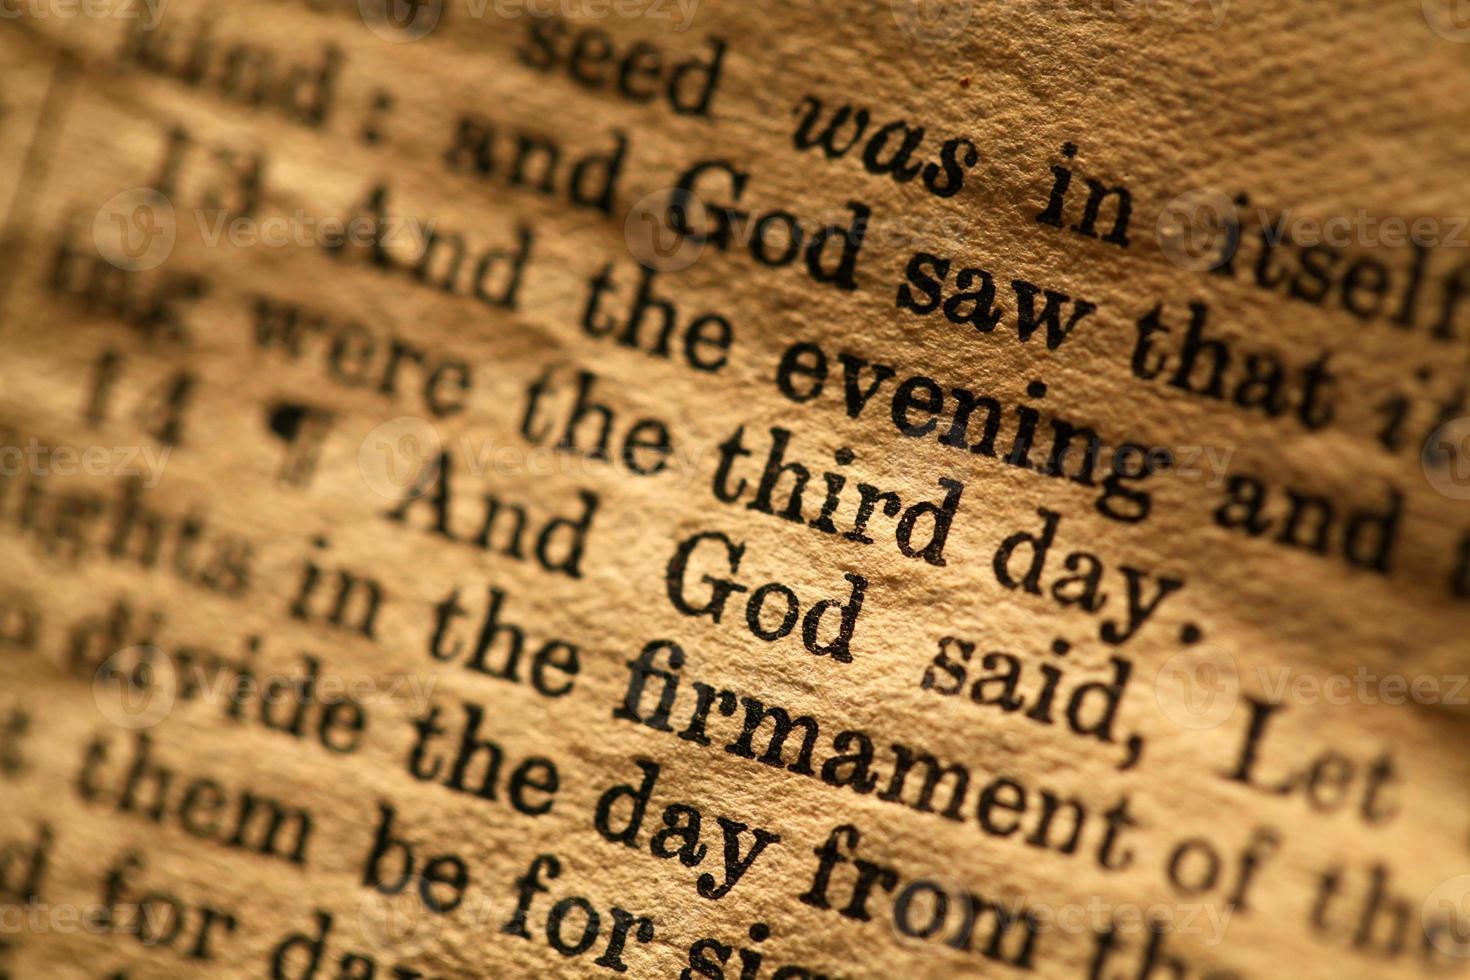 Sacra Bibbia foto